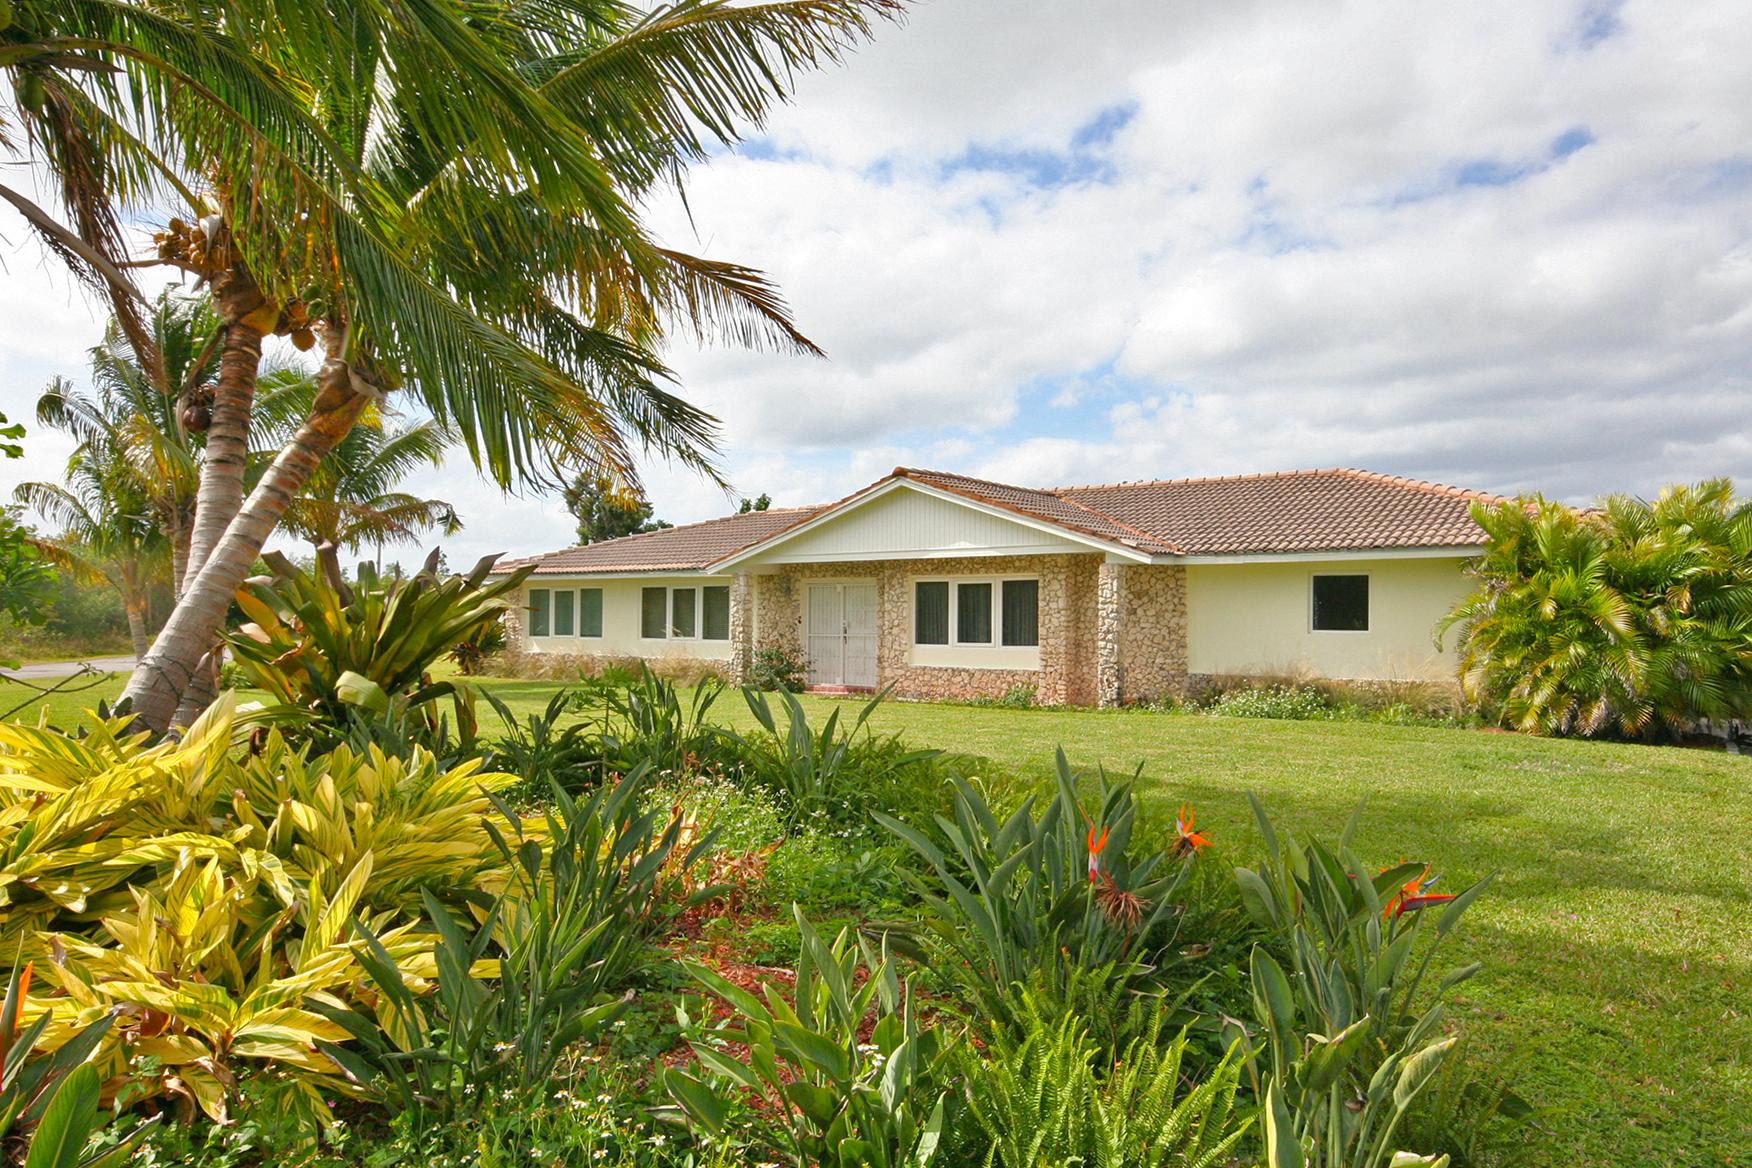 Single Family Home for Sale at Sprawling Family Home with Pool! Bahamia, Grand Bahama, Bahamas